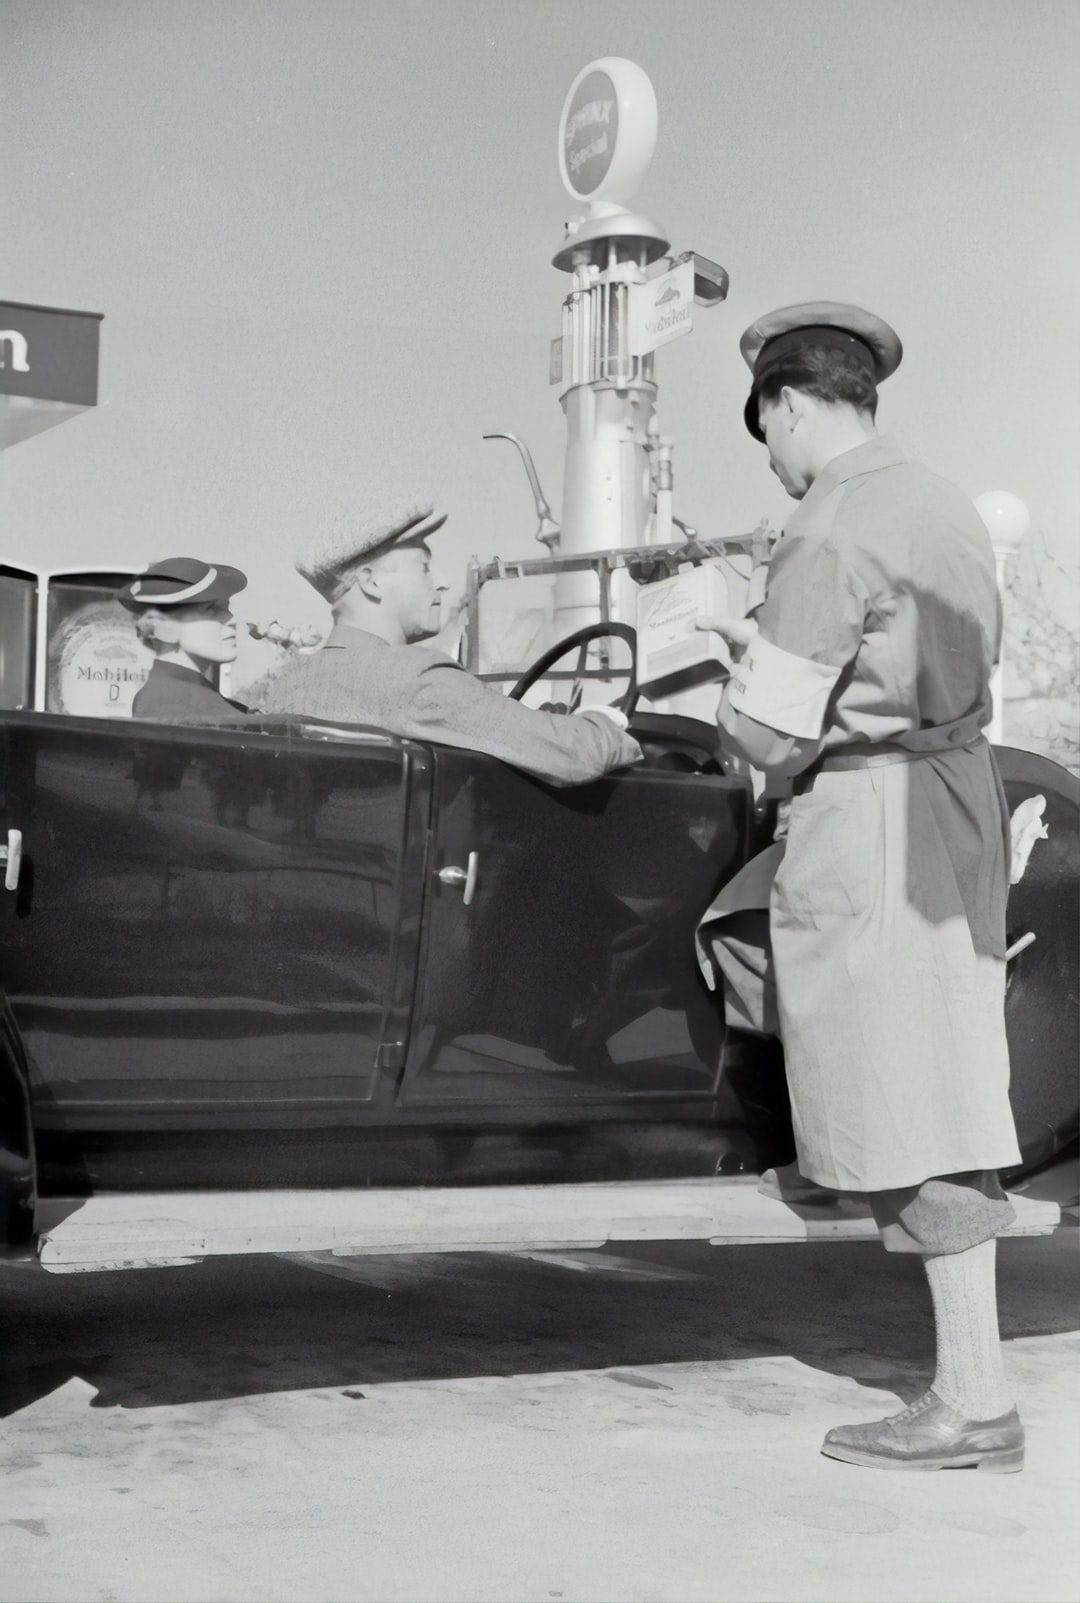 Petrol station in Kagran. 1935